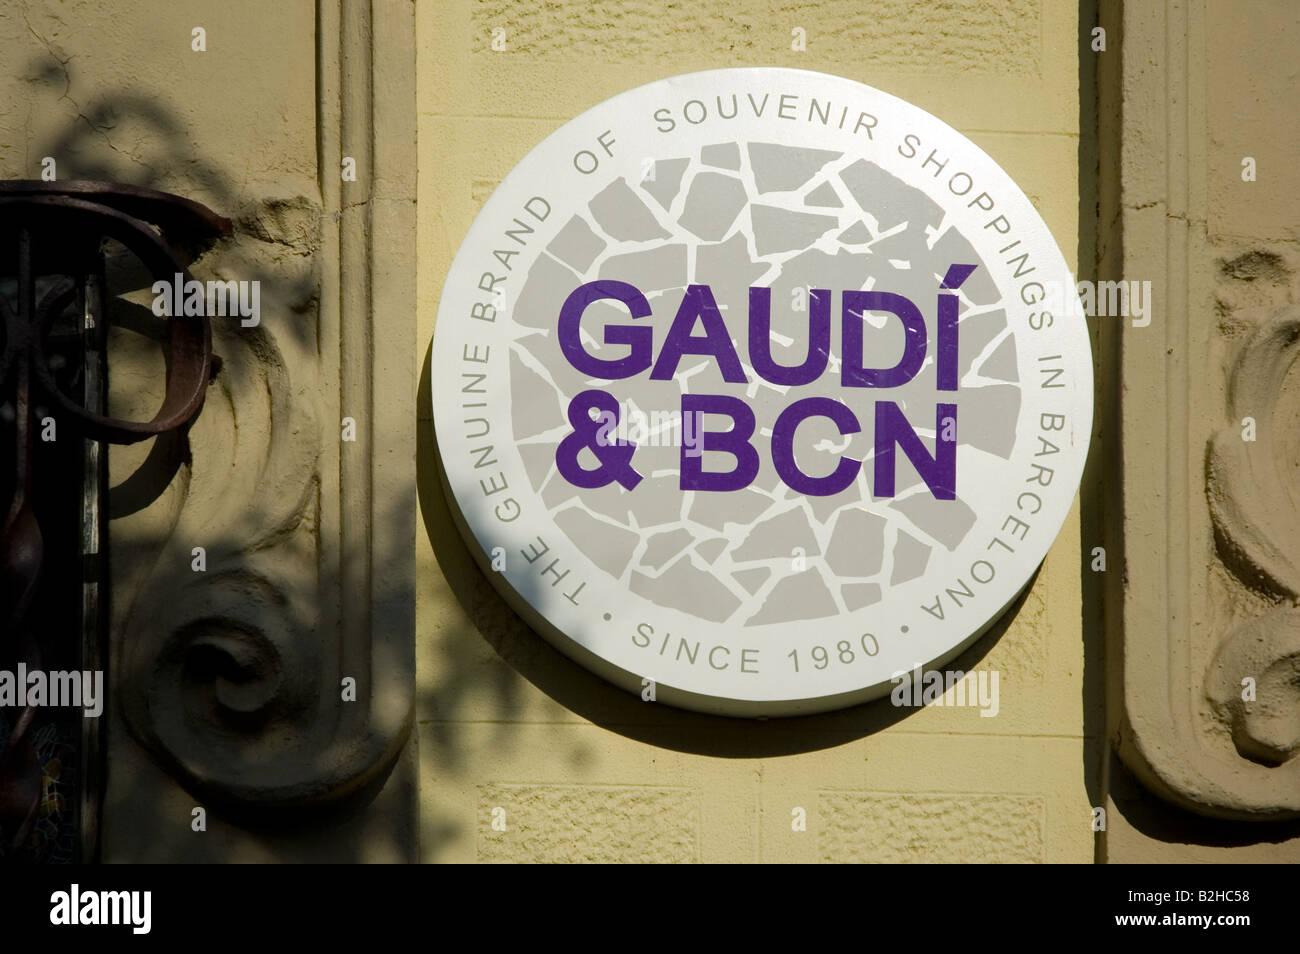 gaudì & bcn sign barcelona spain - Stock Image